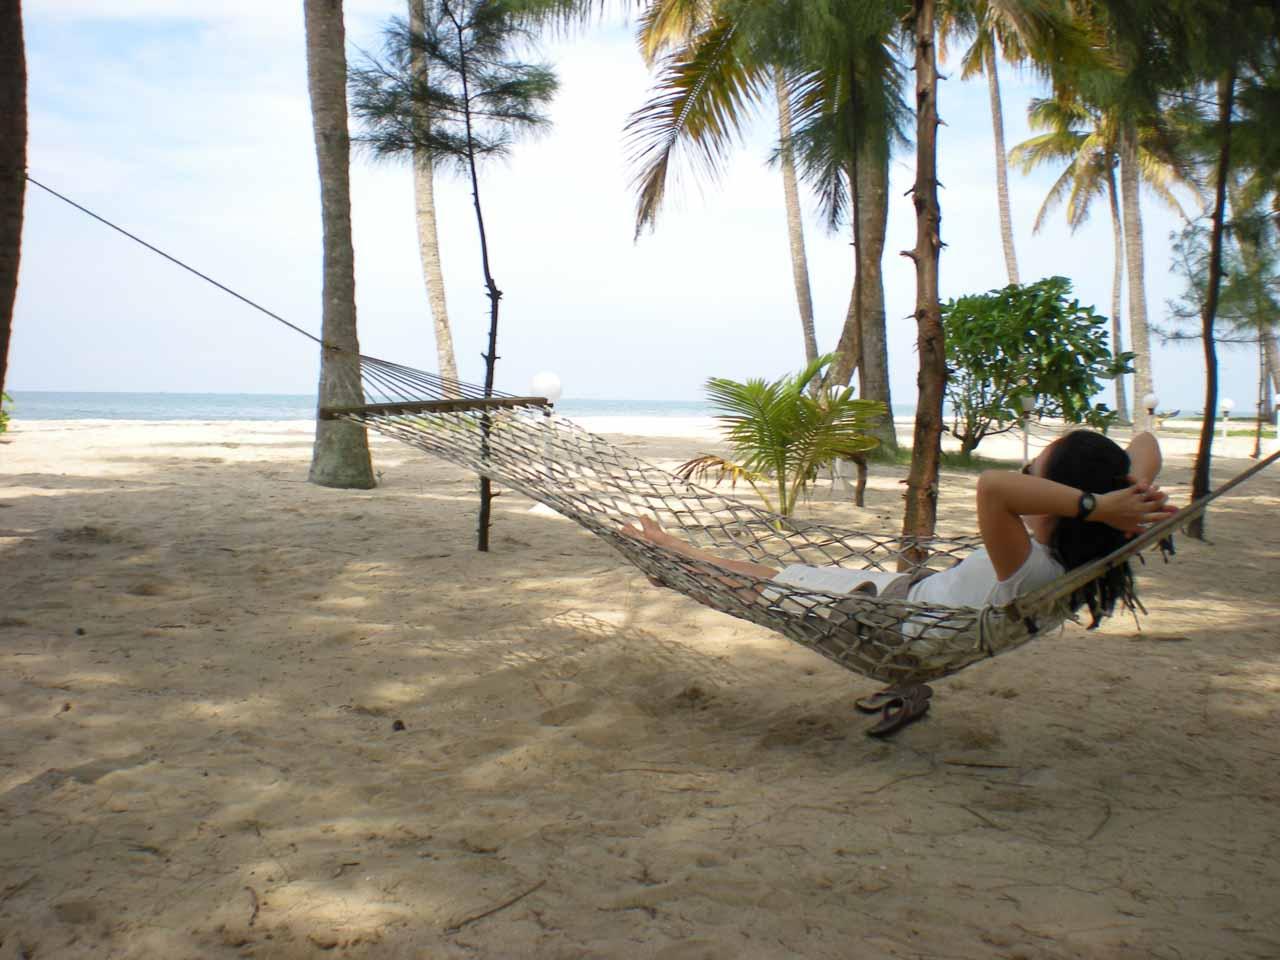 Julie resting on the hammock